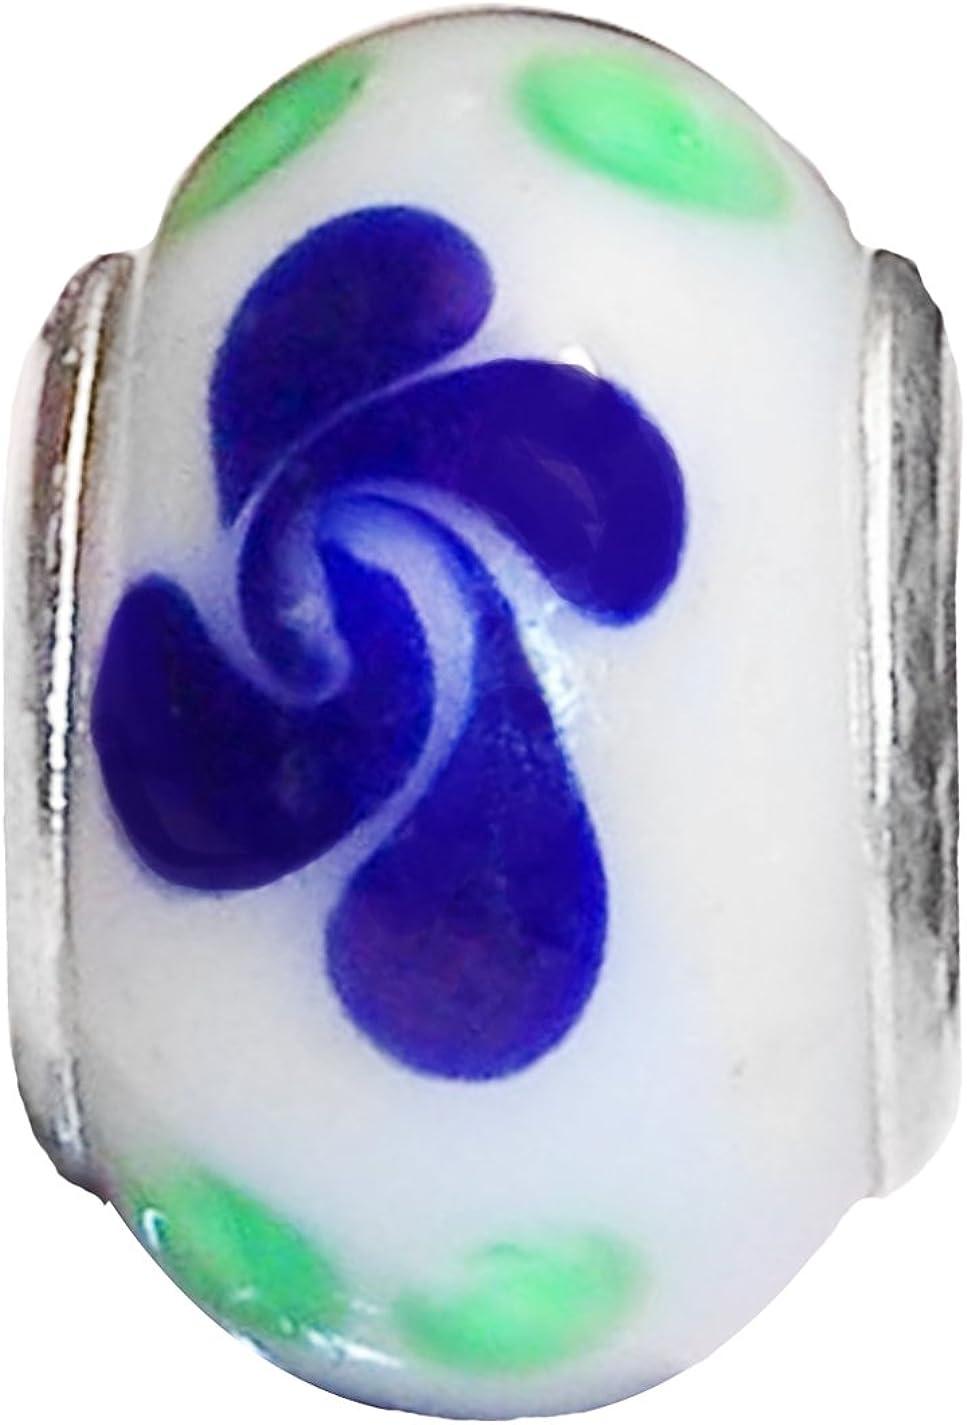 Unique Fashion Charms and Bracelets Blue White Murano Glass Heart Dangle Charm for Silver European Slide Bracelets